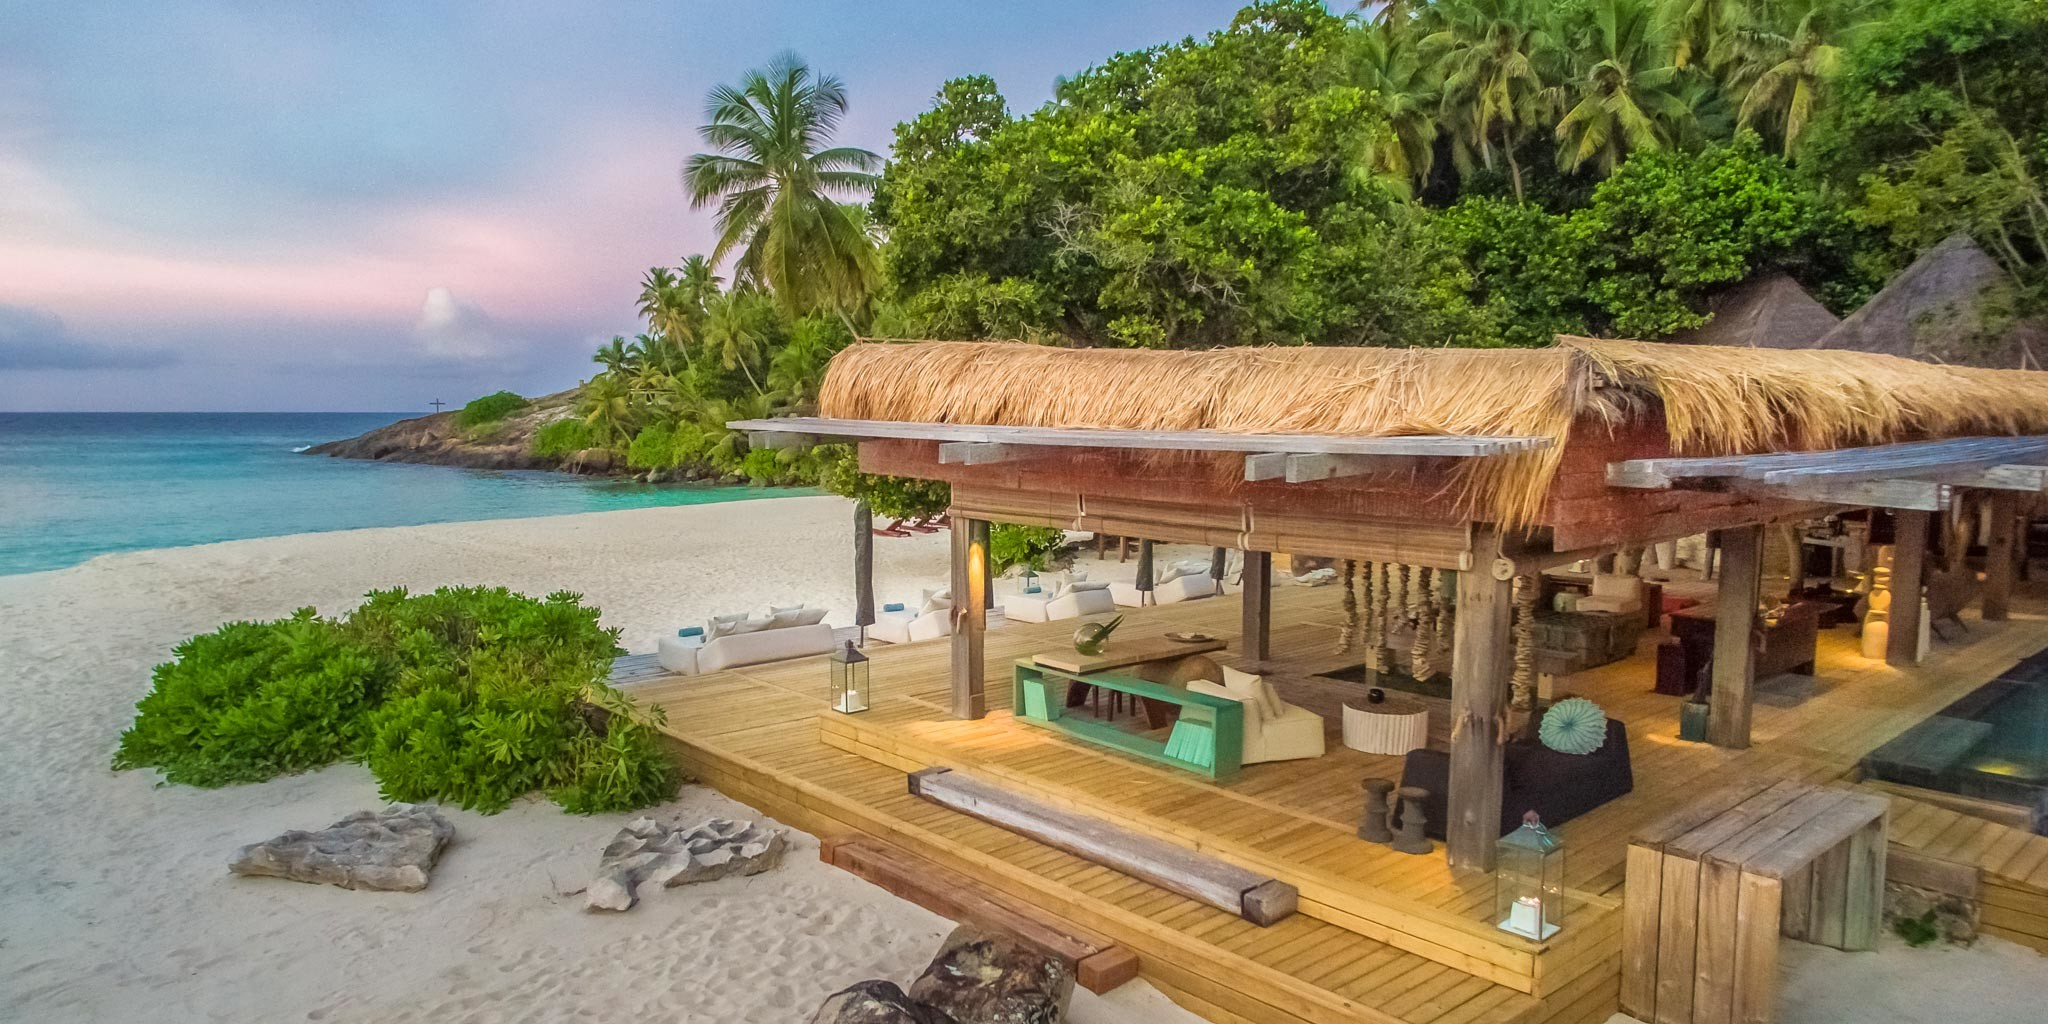 news-main-the-luxury-collection-simplante-sur-lile-de-north-island-aux-seychelles.1554814191.jpg